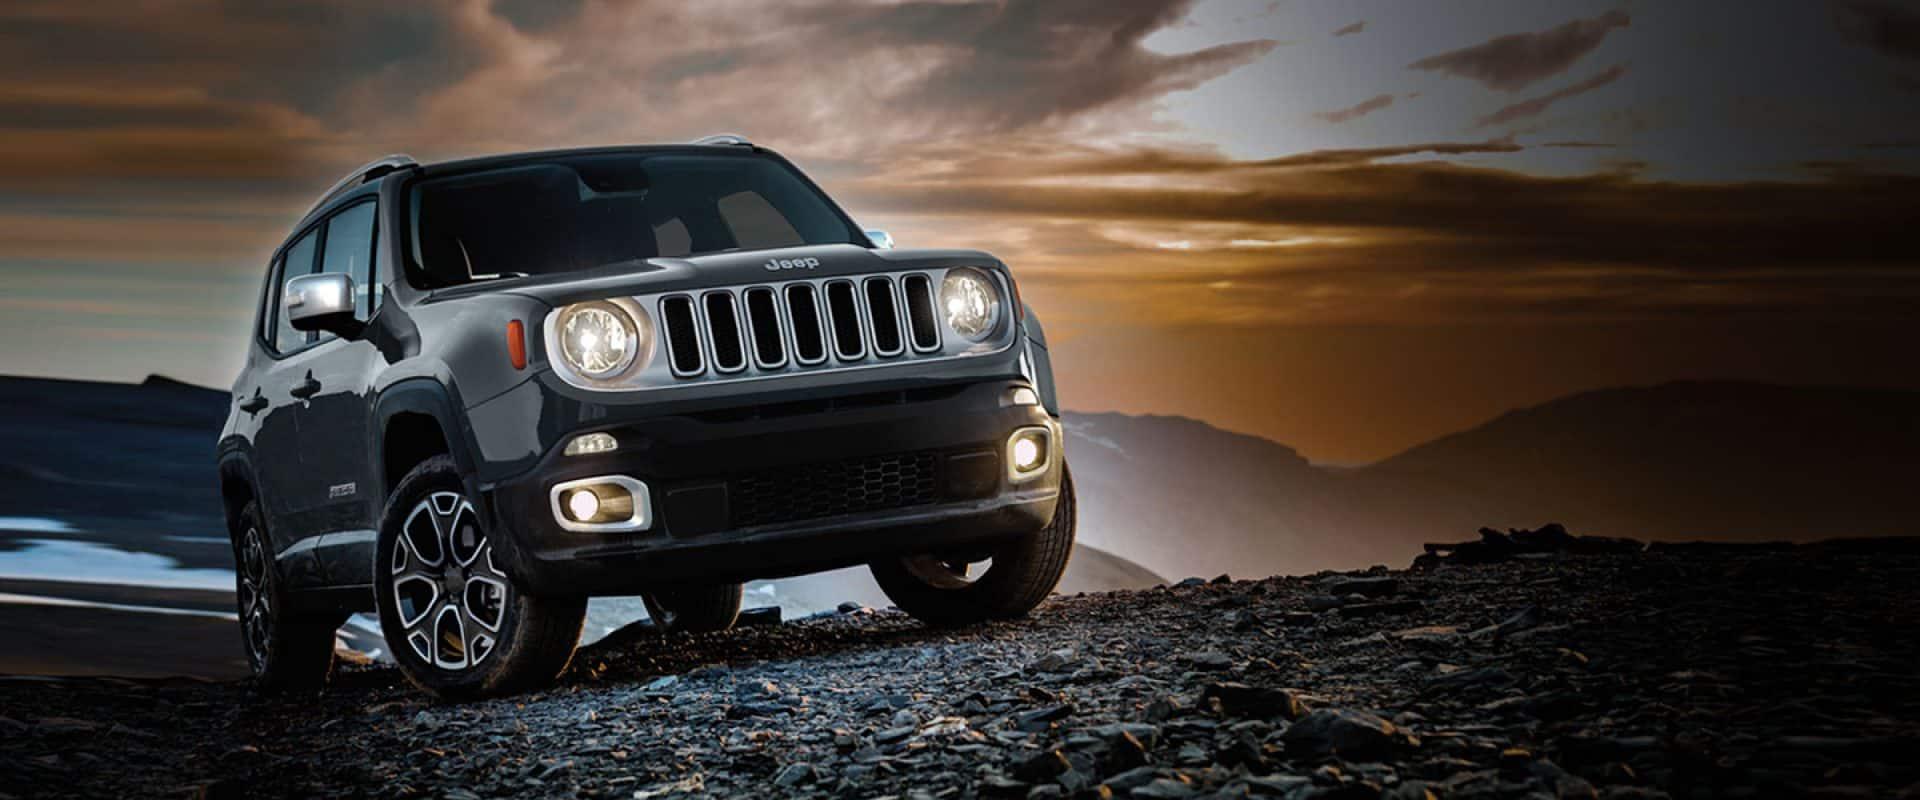 2018 Jeep Renegade $4000 Total Cash